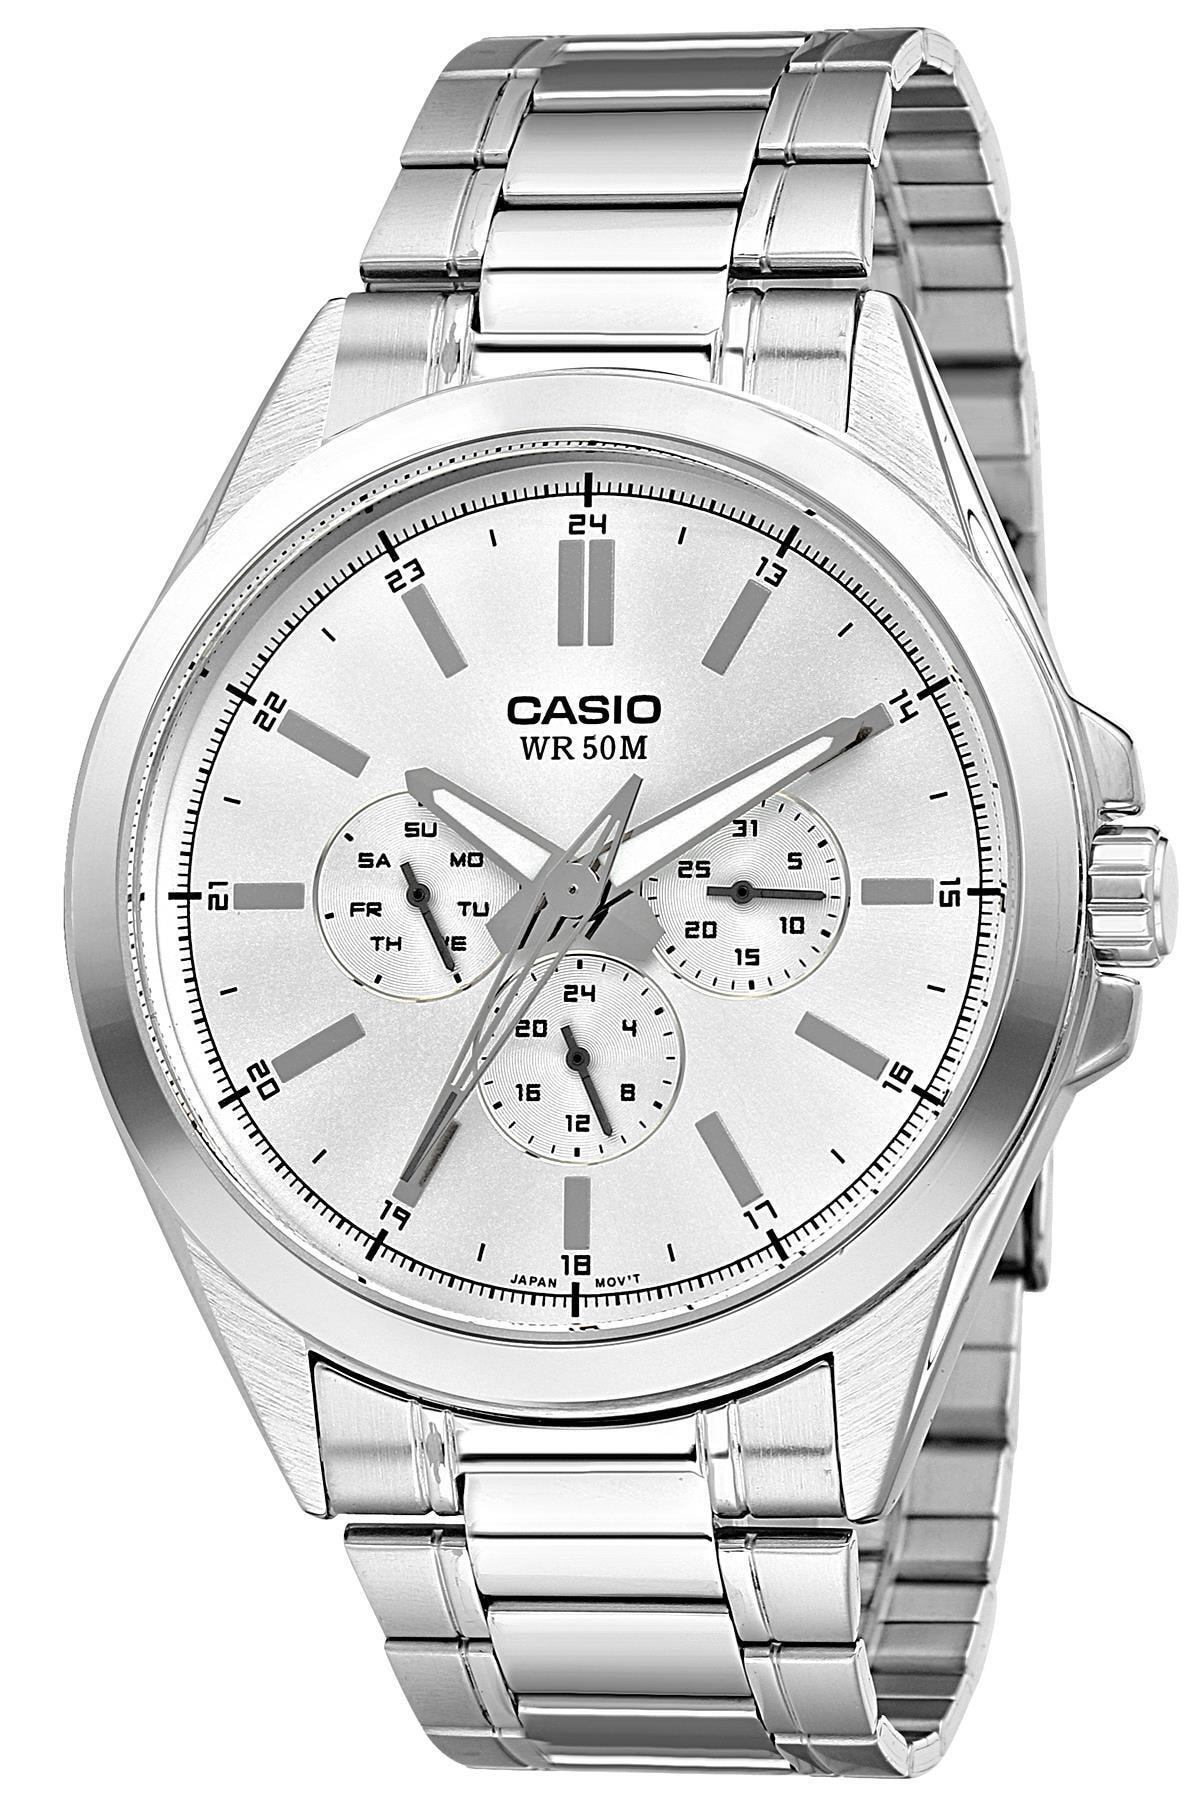 Casio Mtp-sw300d-7avdf Erkek Kol Saati 1